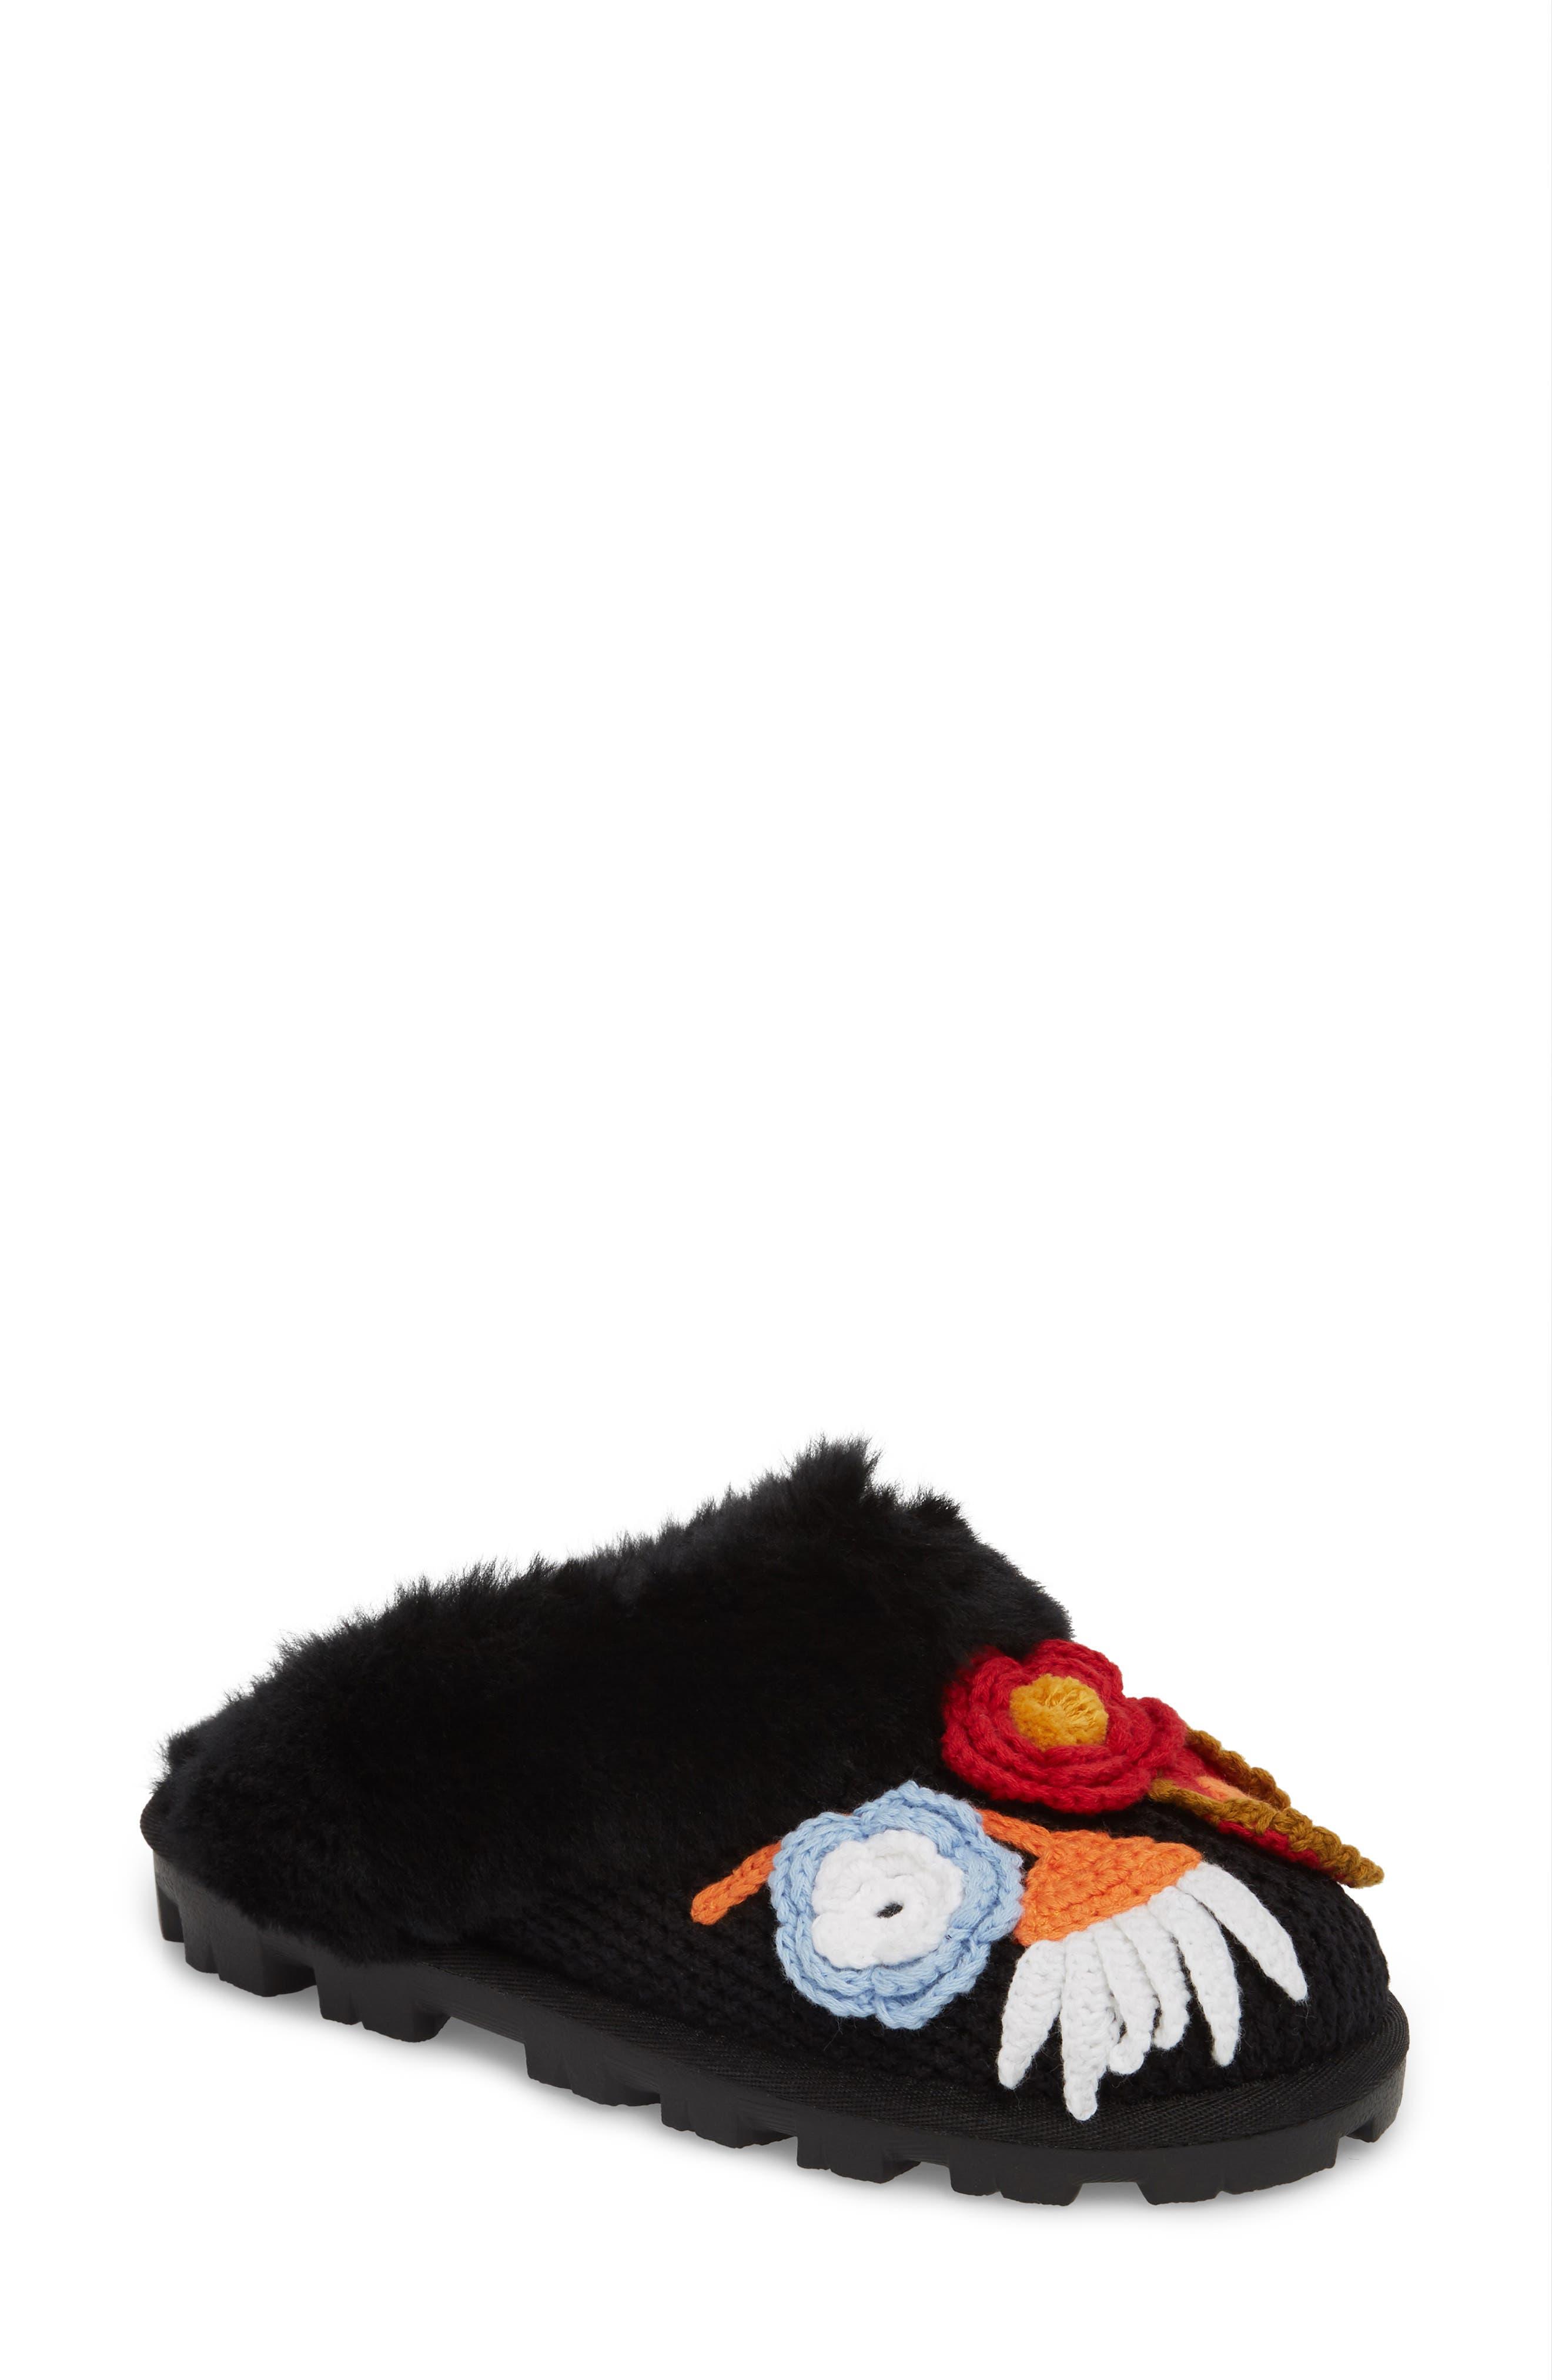 Crochet Genuine Shearling Slipper,                         Main,                         color, Black